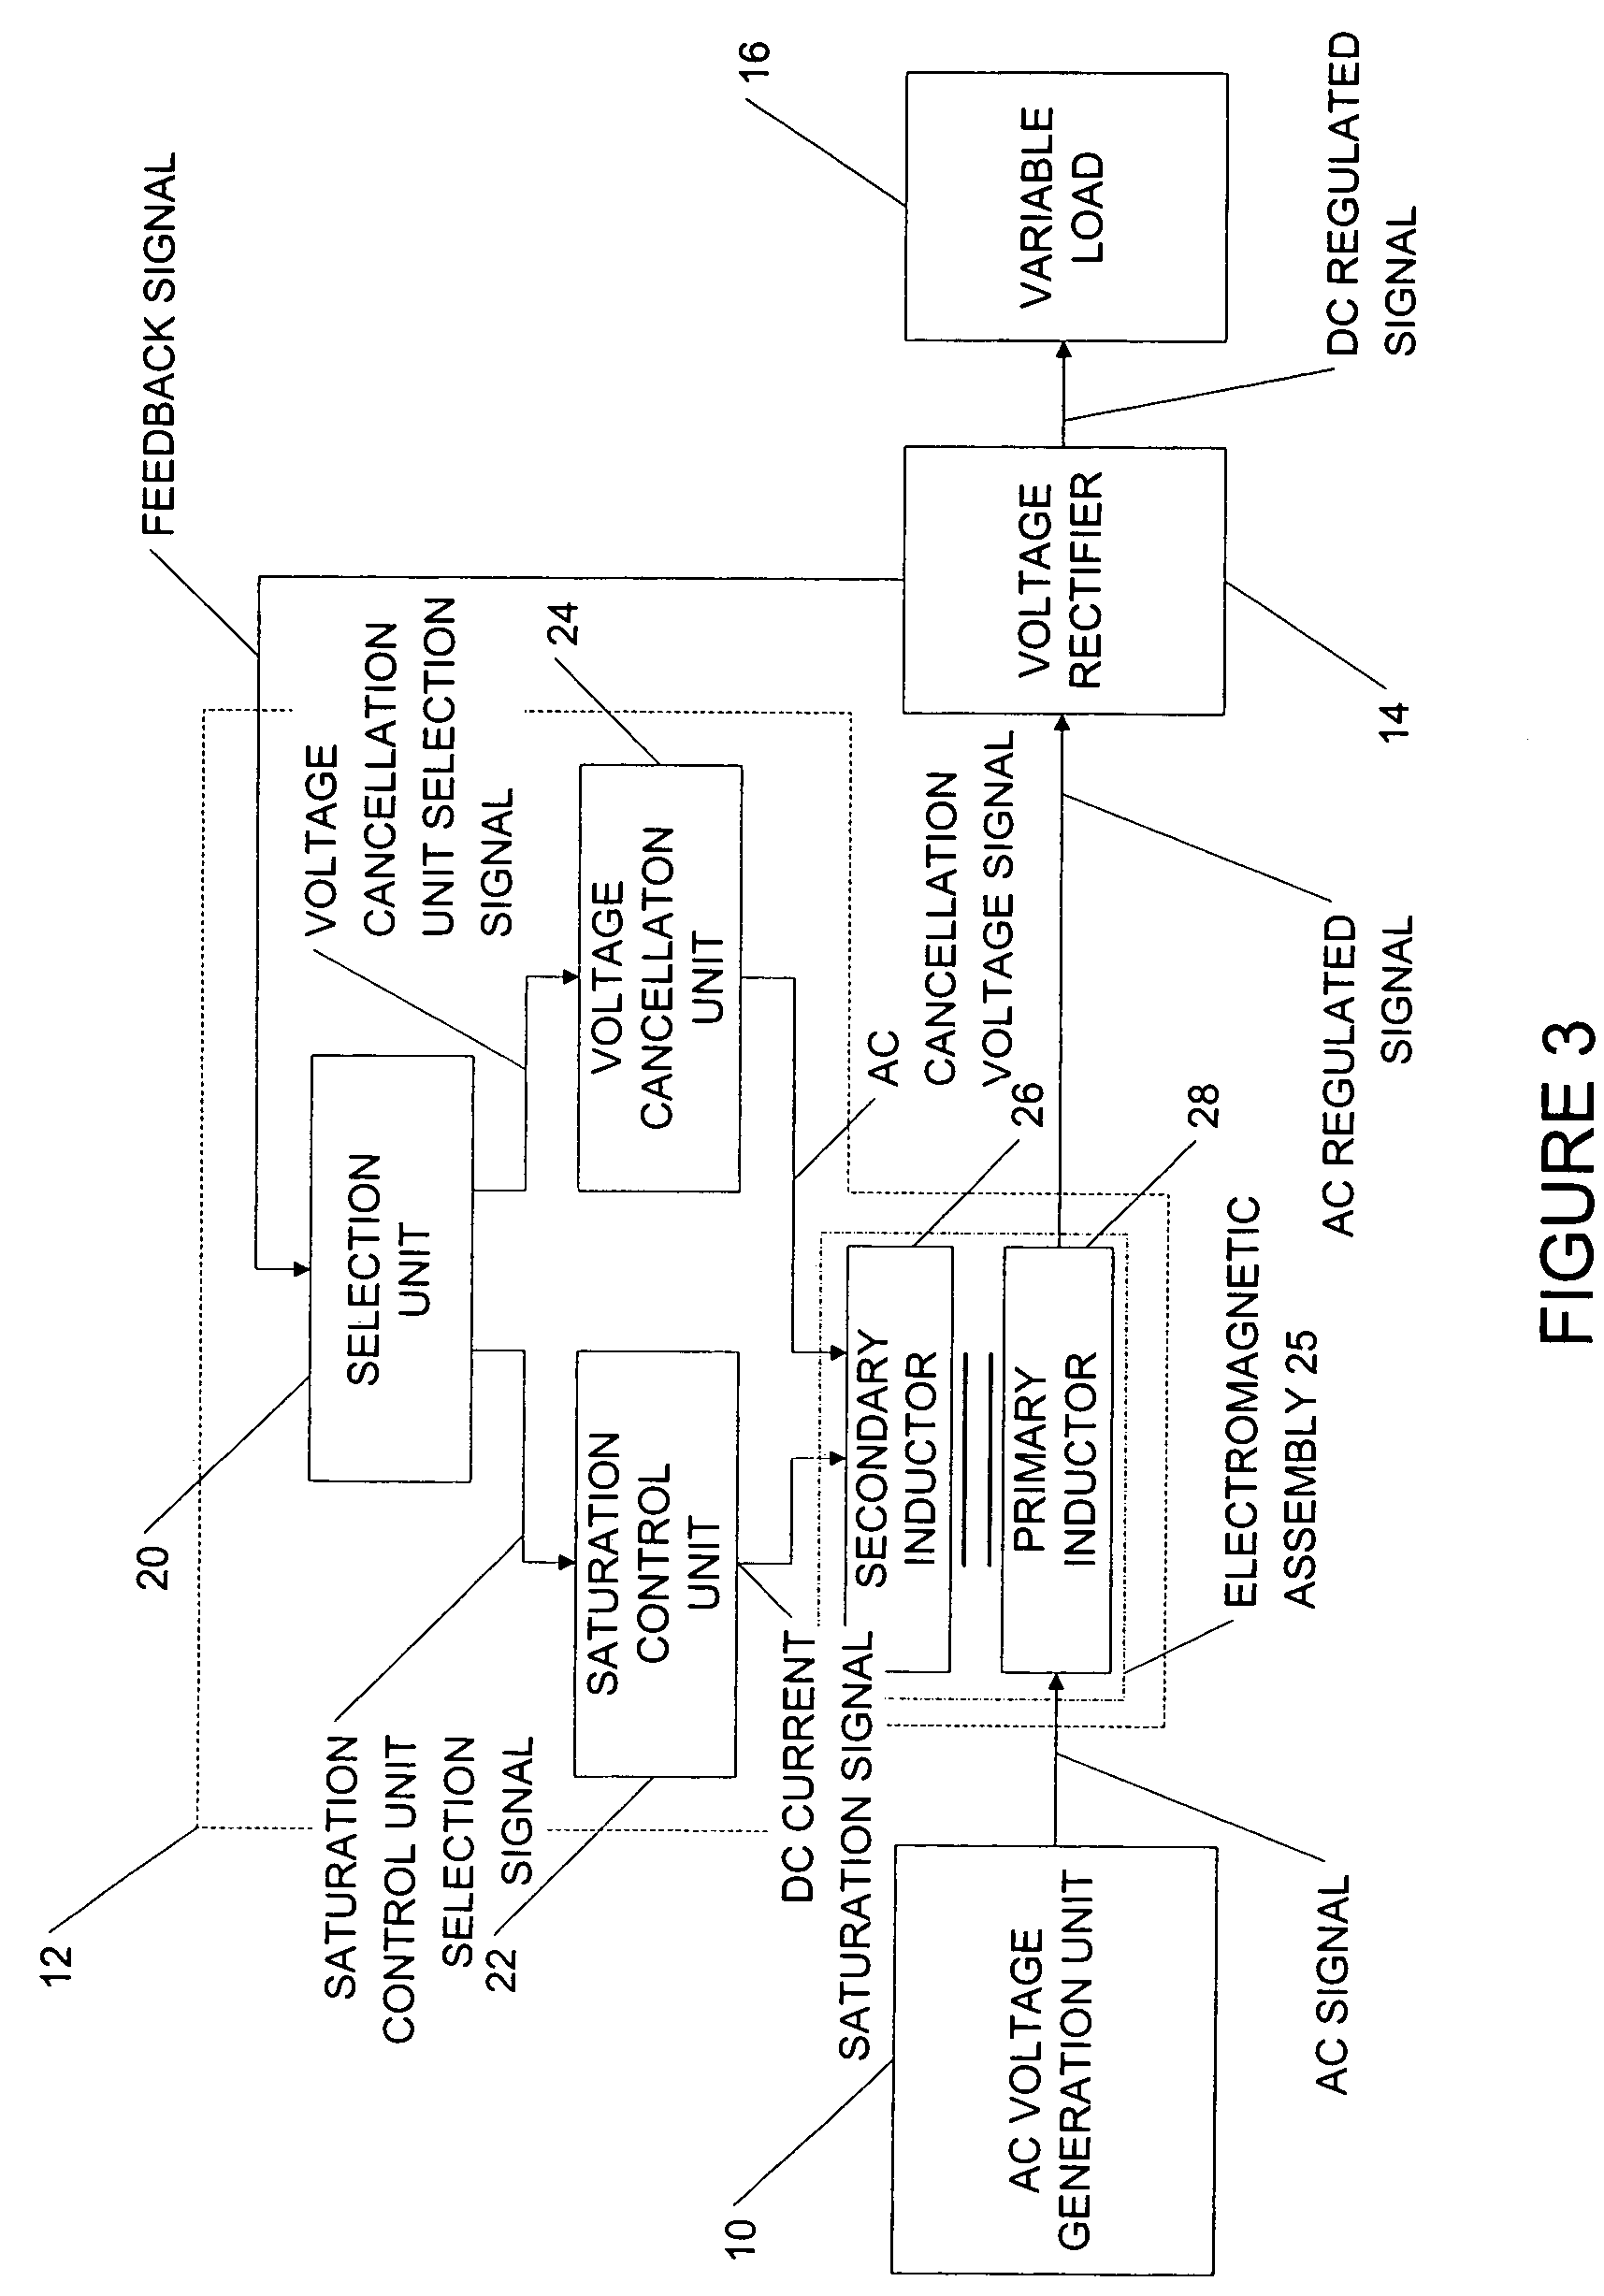 Transfer Switch Schematic Diagram Generac Generator Wiring Diagrams